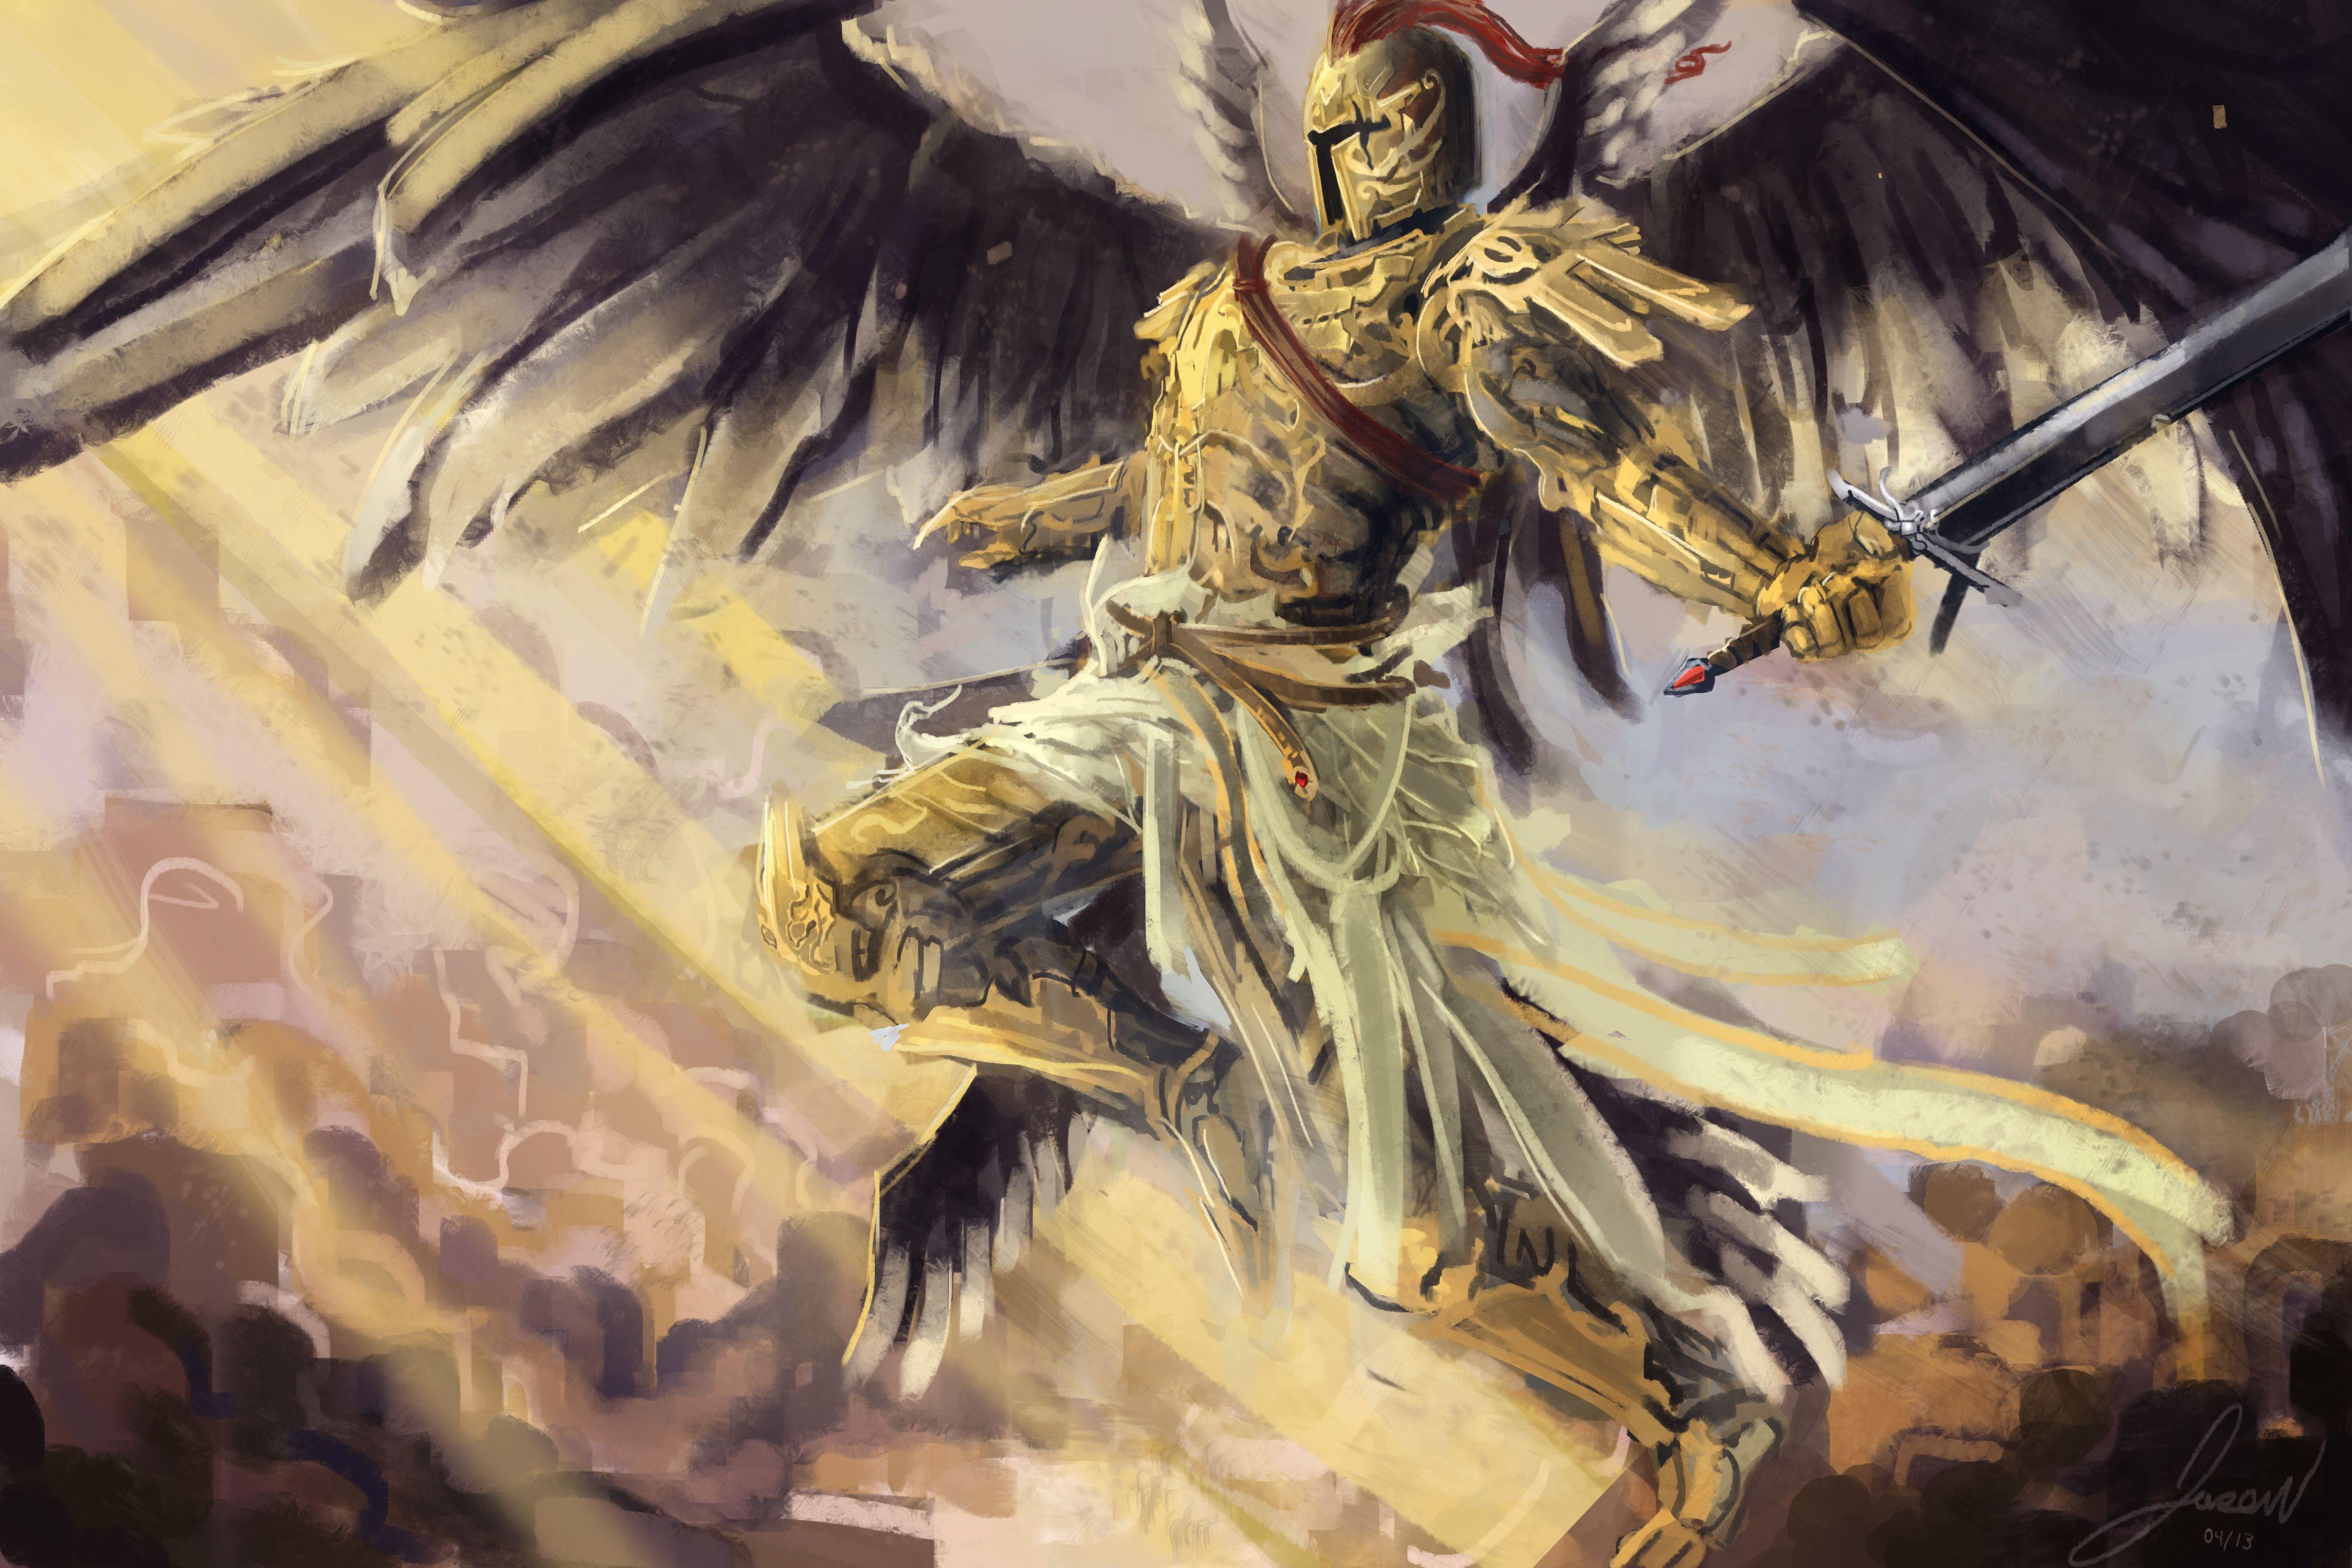 Angel Warrior Backgrounds on Wallpapers Vista